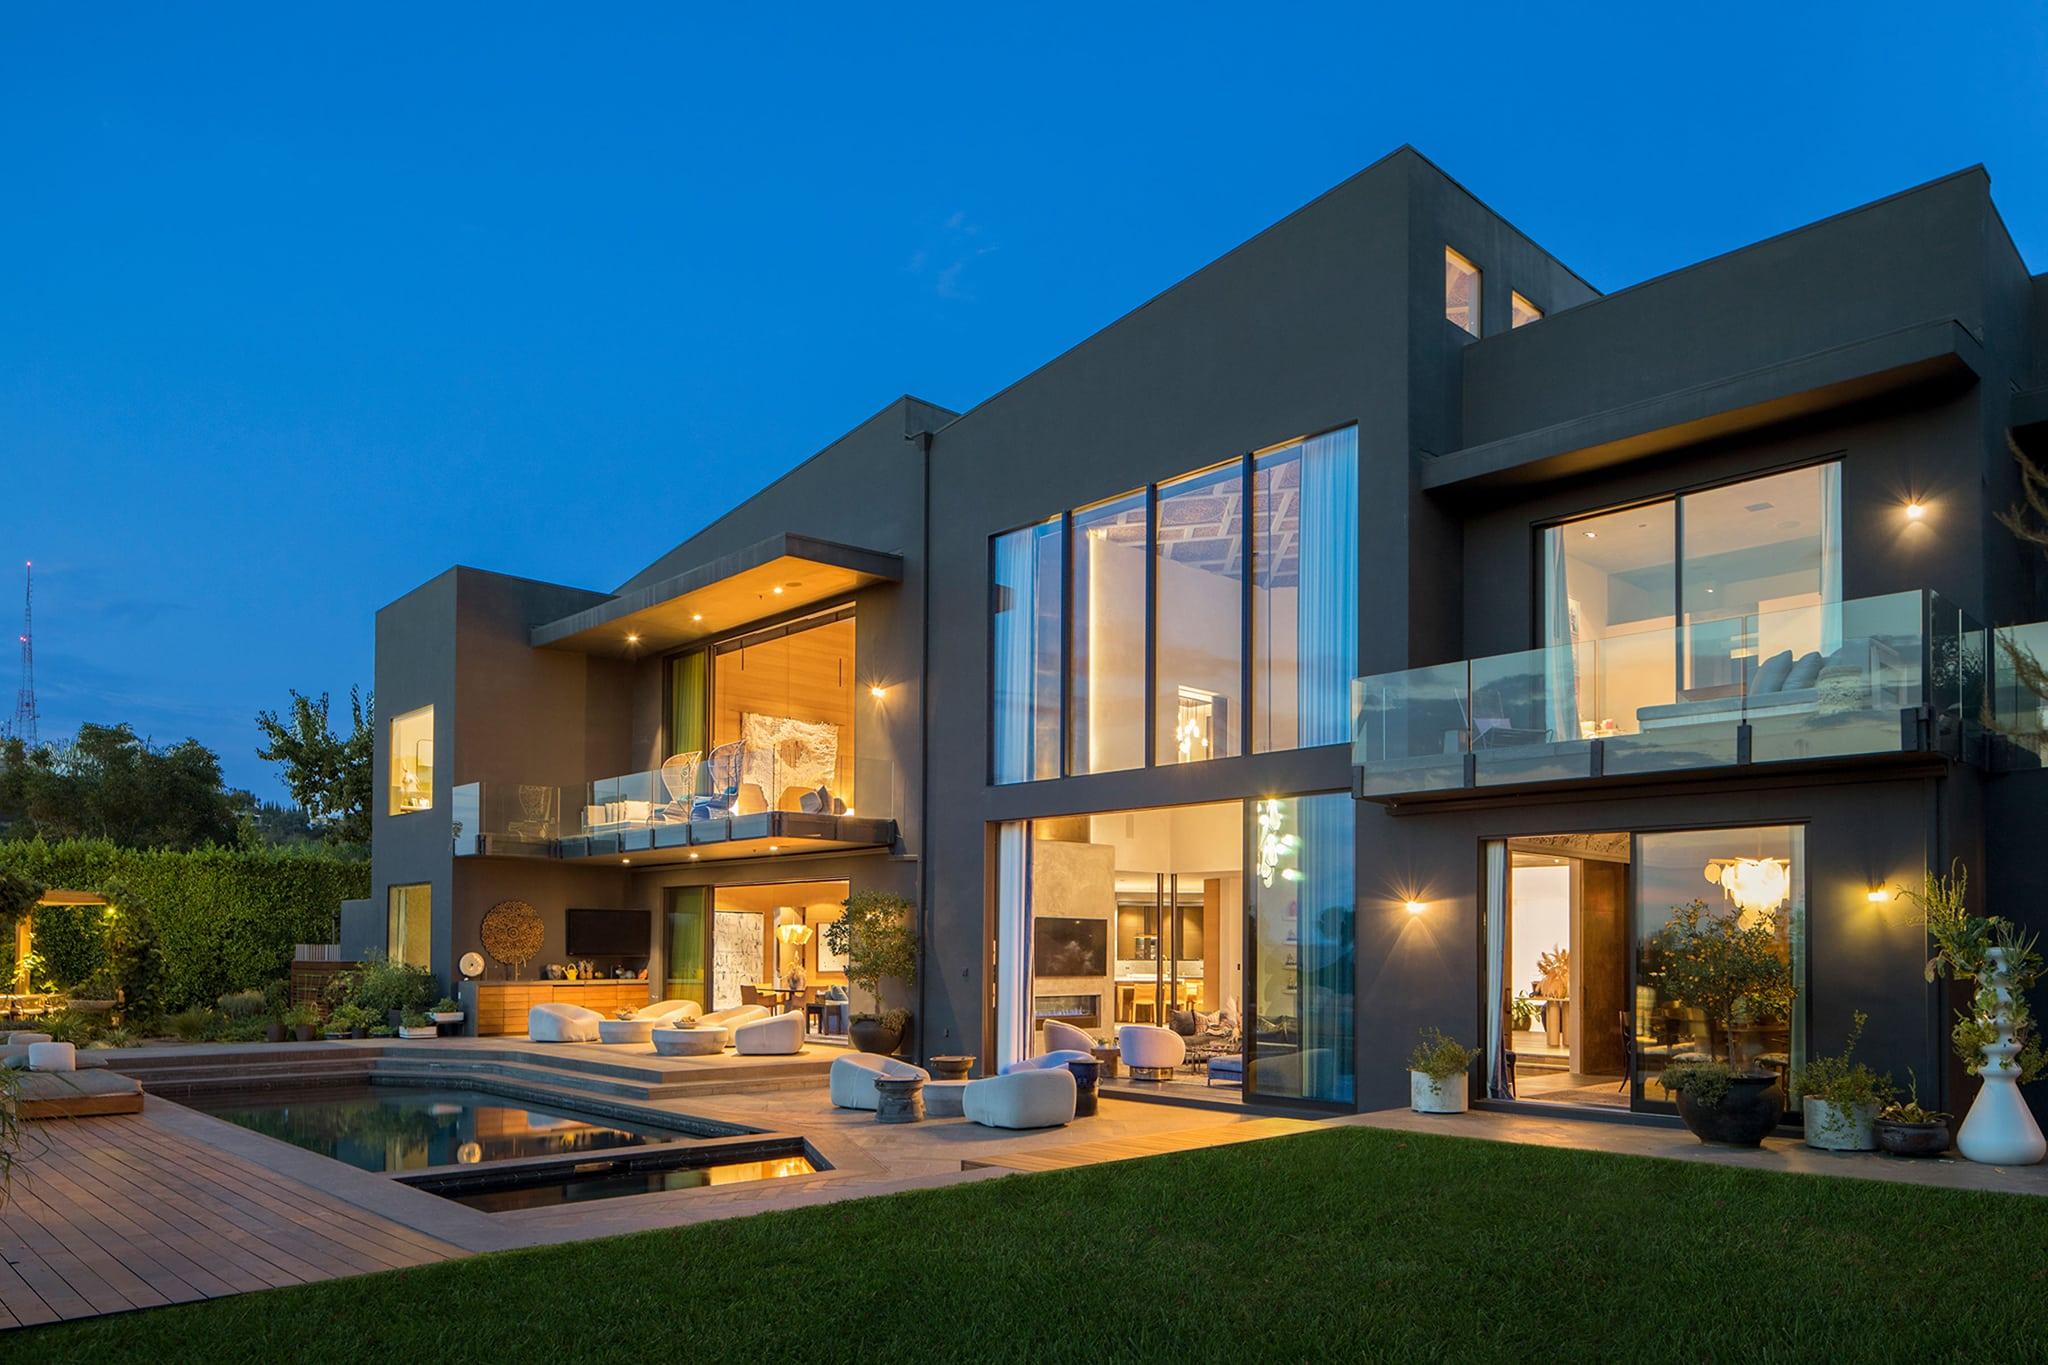 John Legend and Chrissy Teigen sell their Beverly Hills mansion for $16.8 million